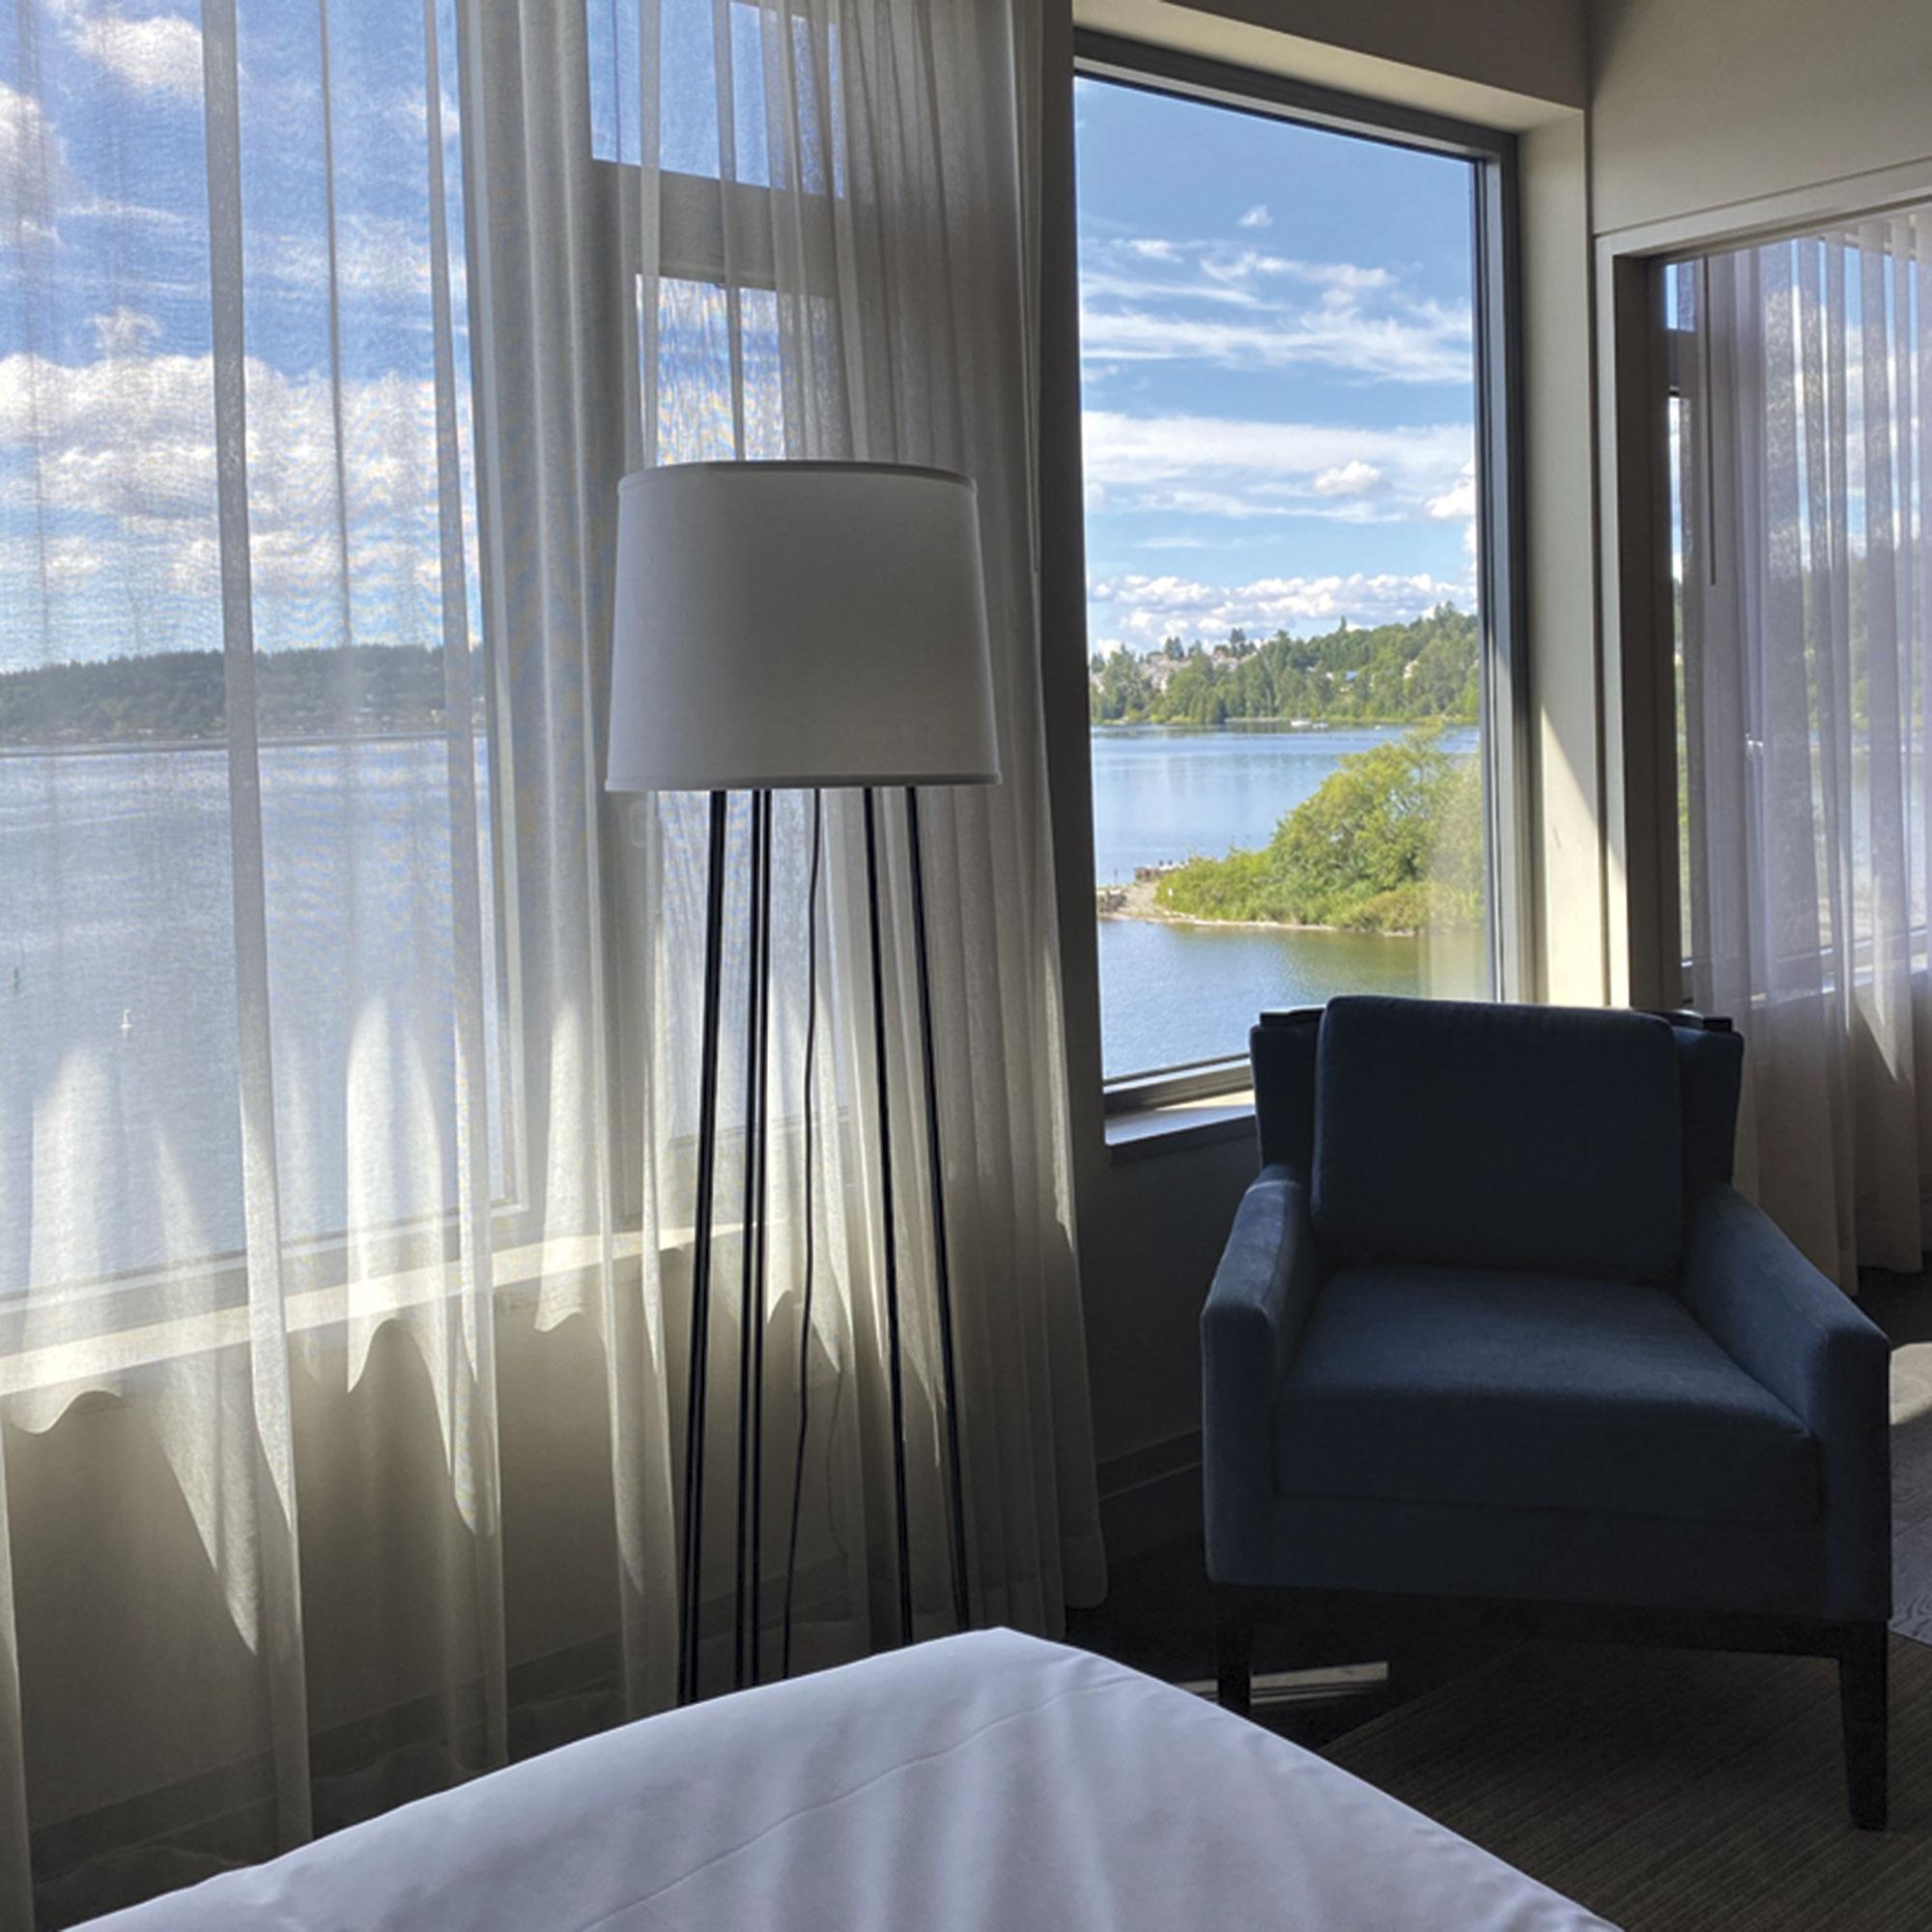 Suite view at Hyatt Regency Lake Washington; Photo by Madison Rutherford